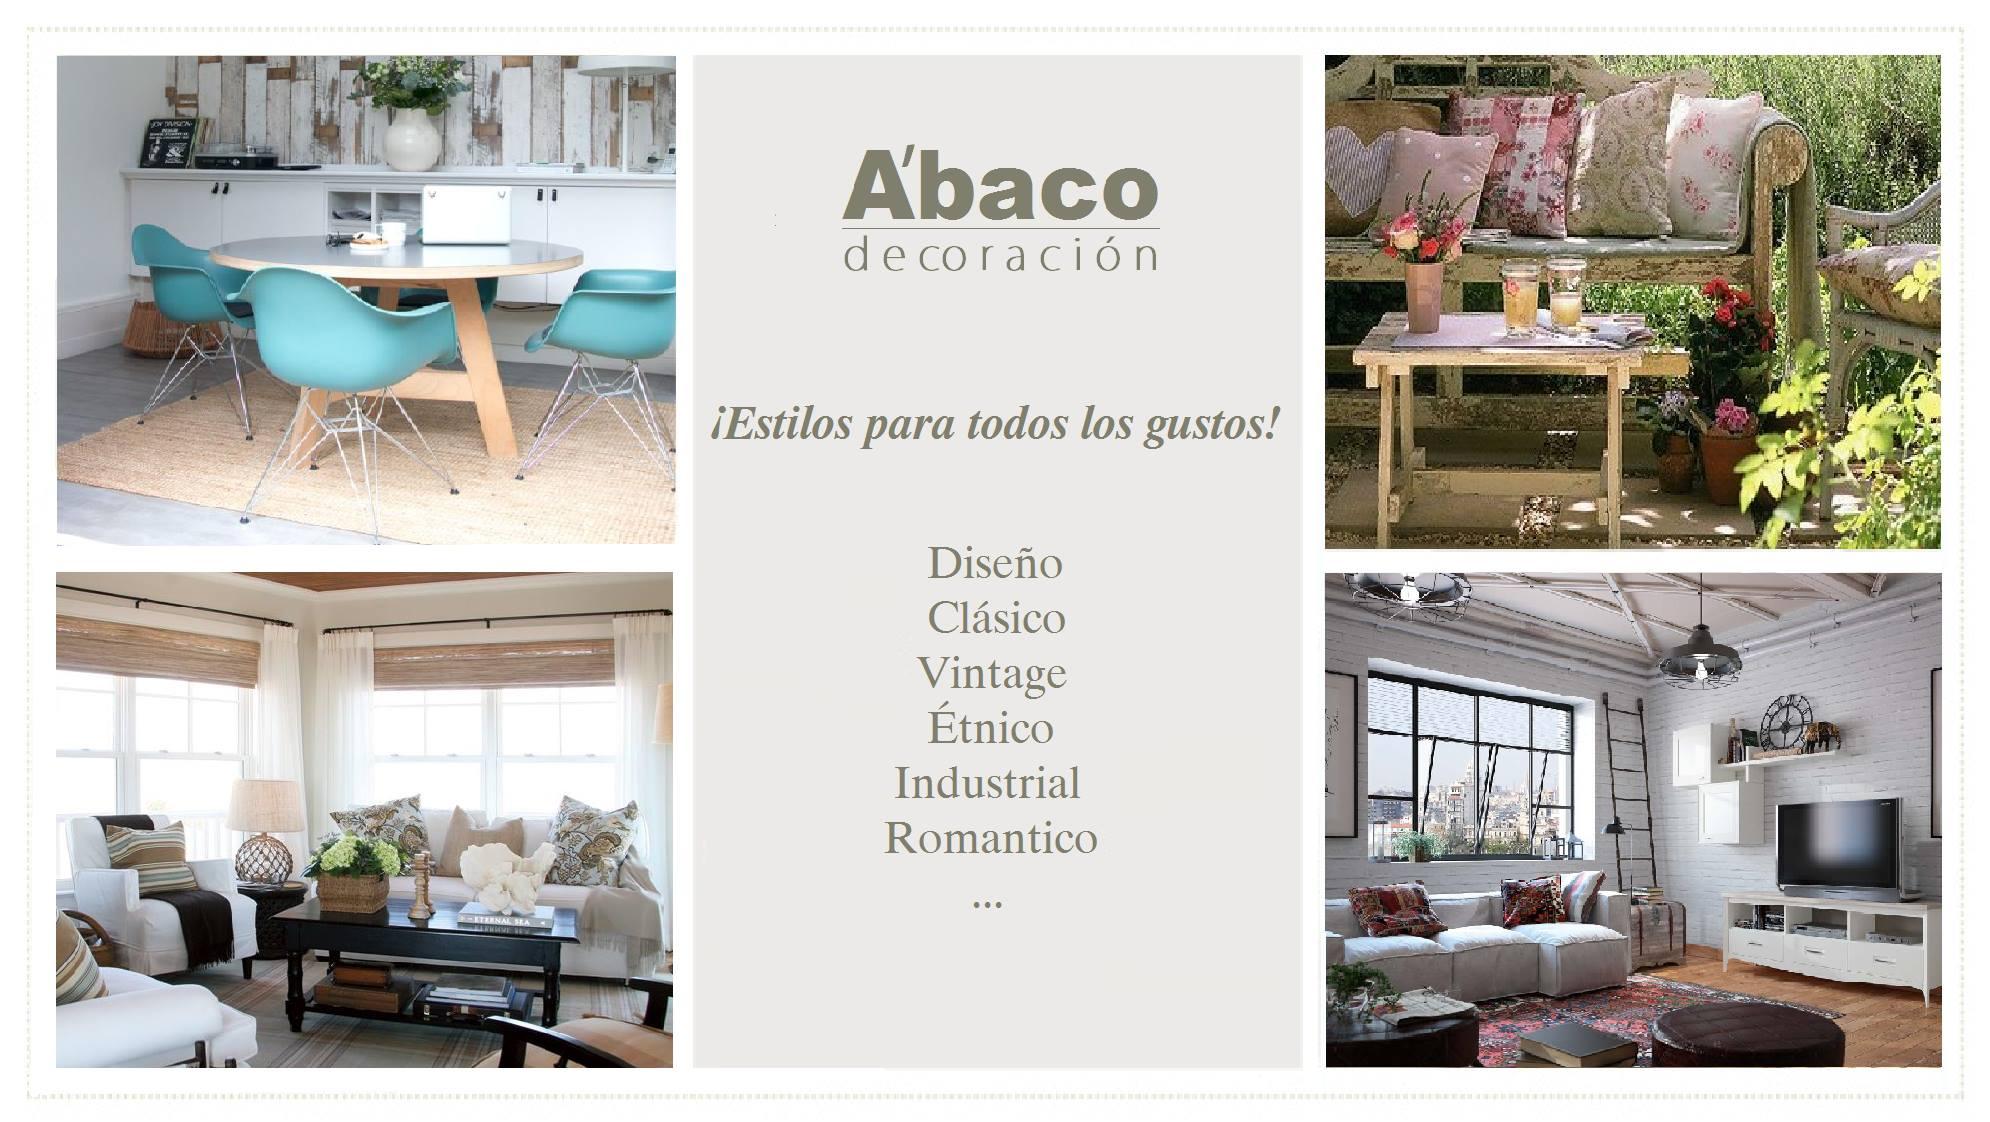 Abaco decoraci n tenerife mobiliario textil iluminaci n - Decoracion tenerife ...